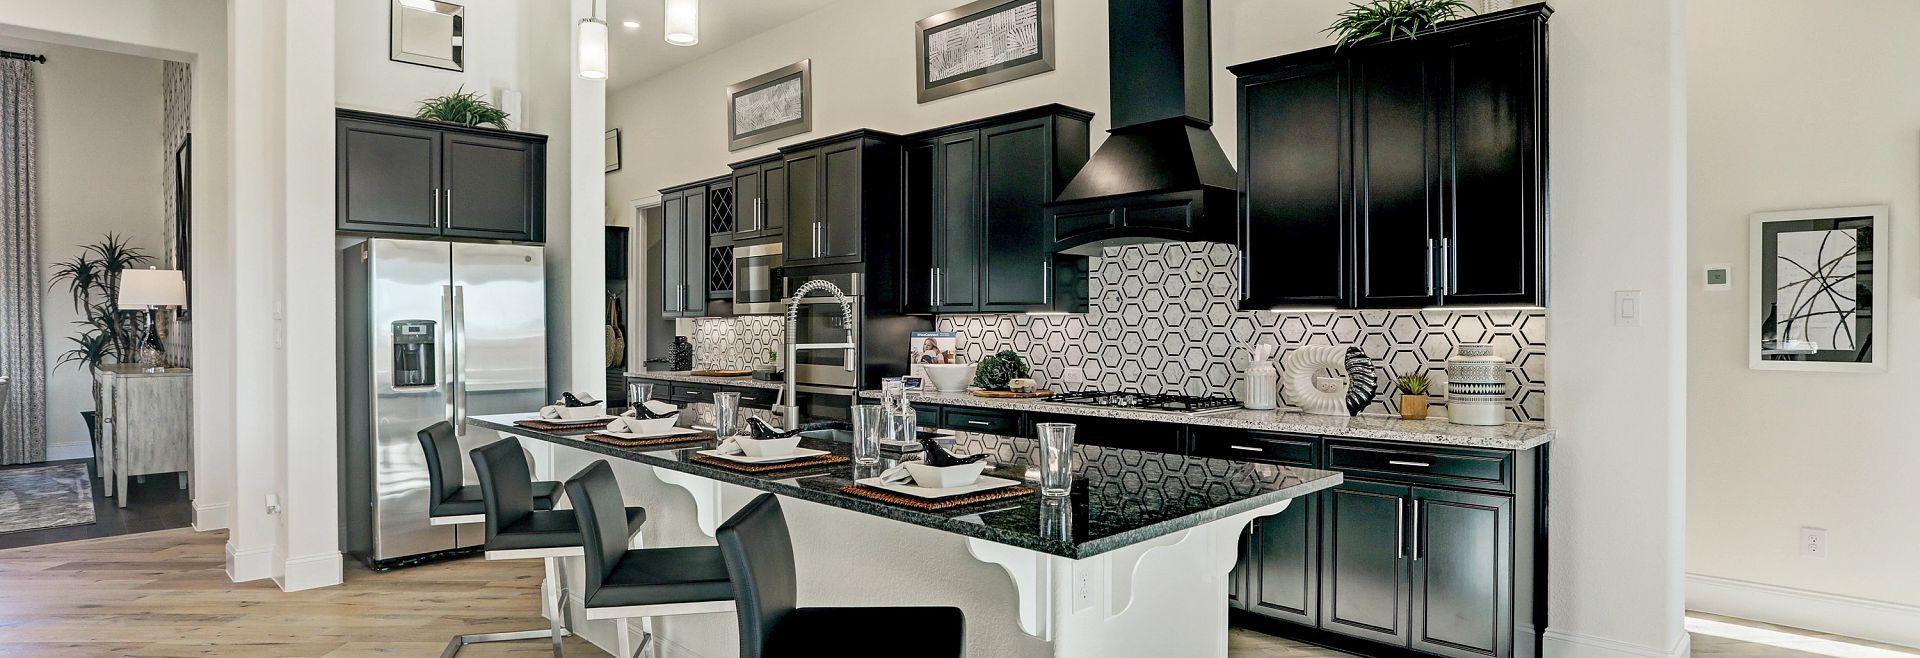 Del Bello Lakes 70 Plan 6015 Kitchen